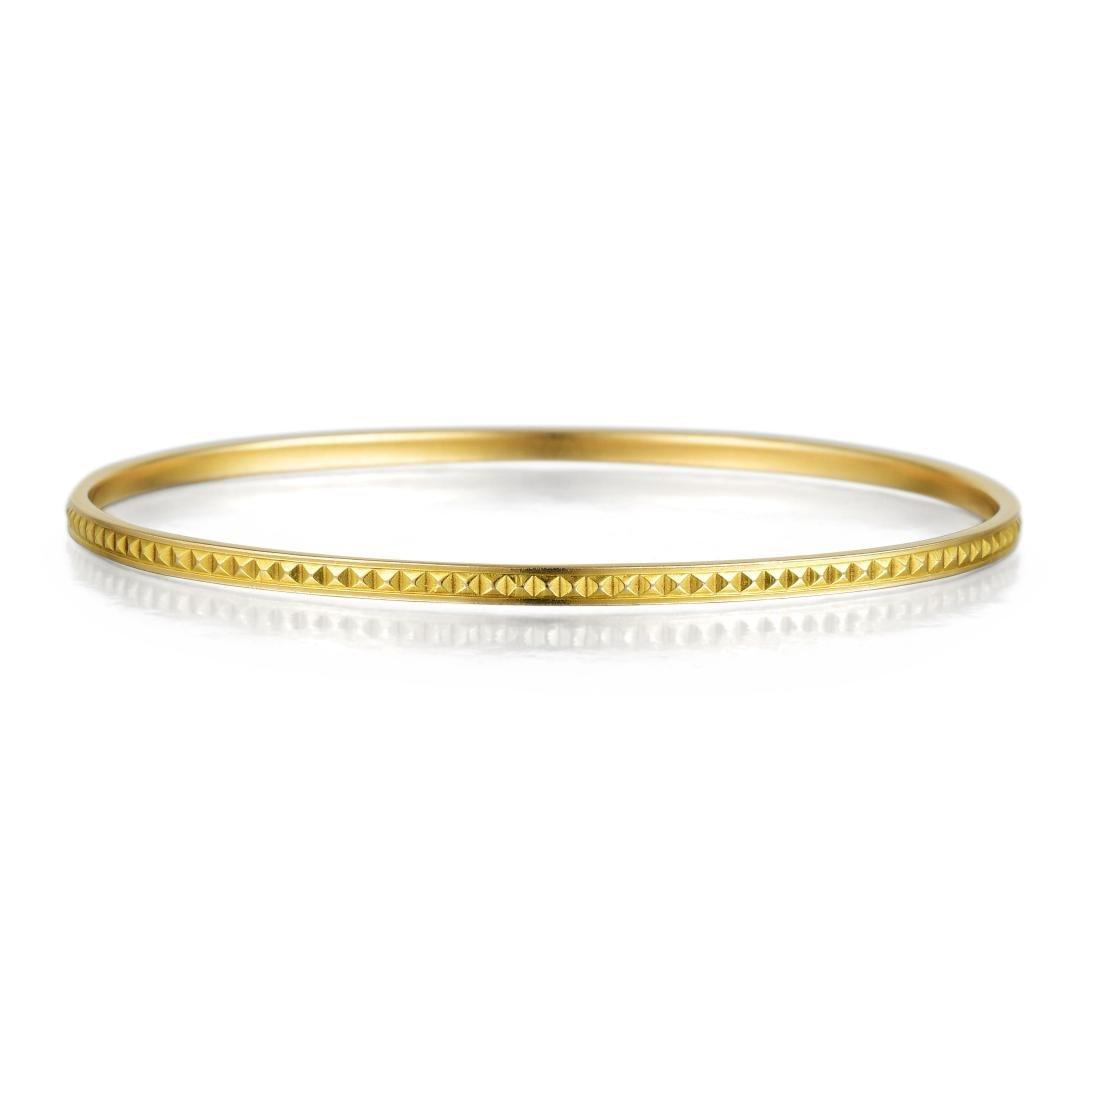 Tiffany & Co. Gold Bangle